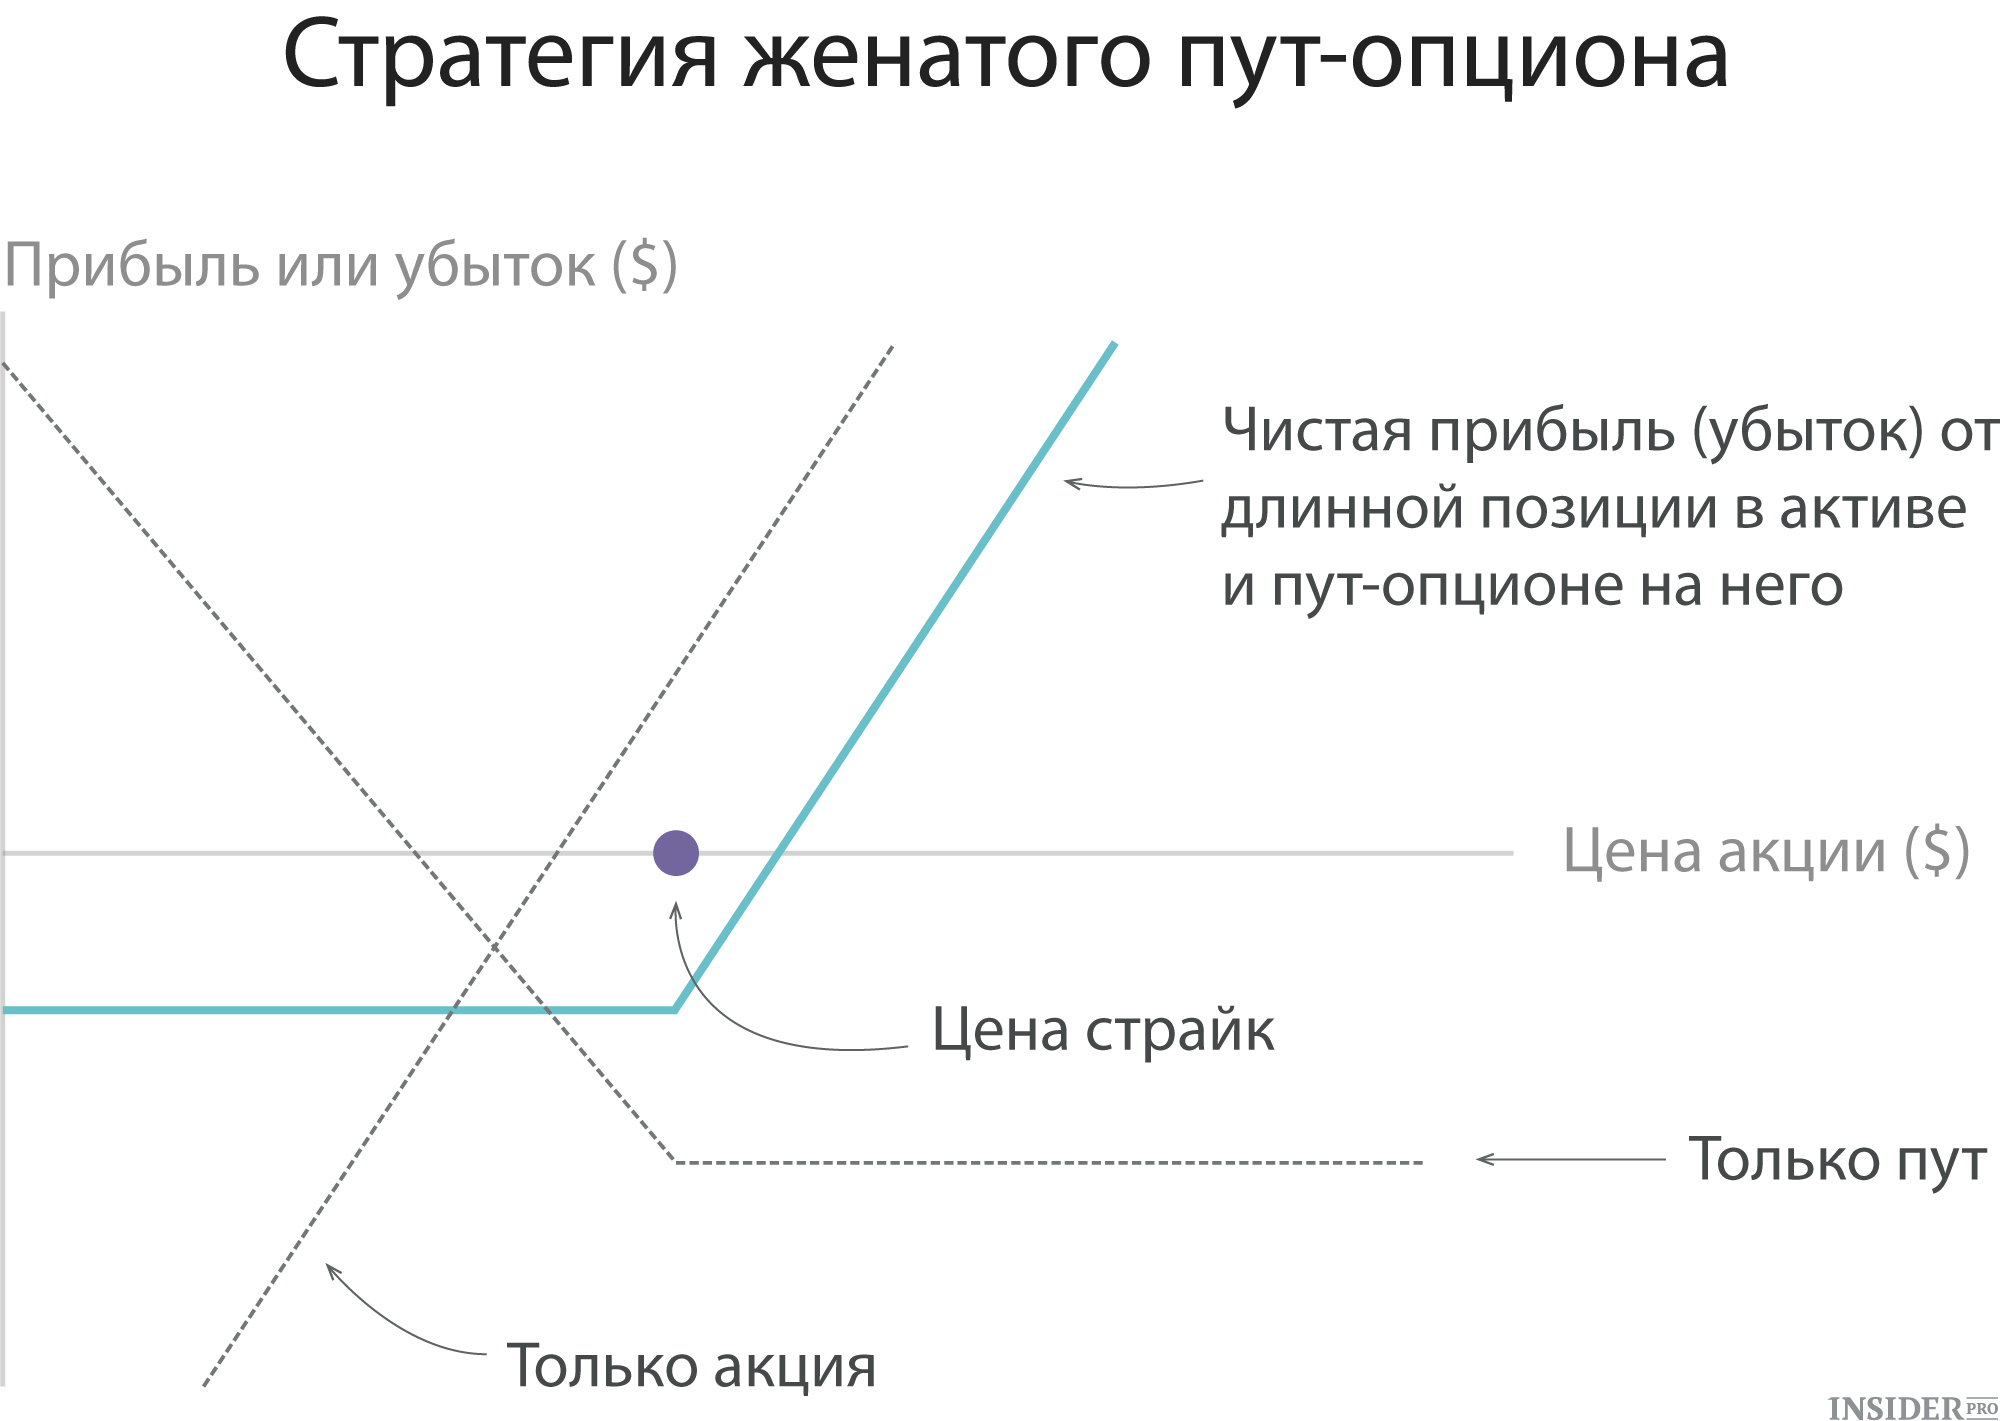 bināro opciju teorija